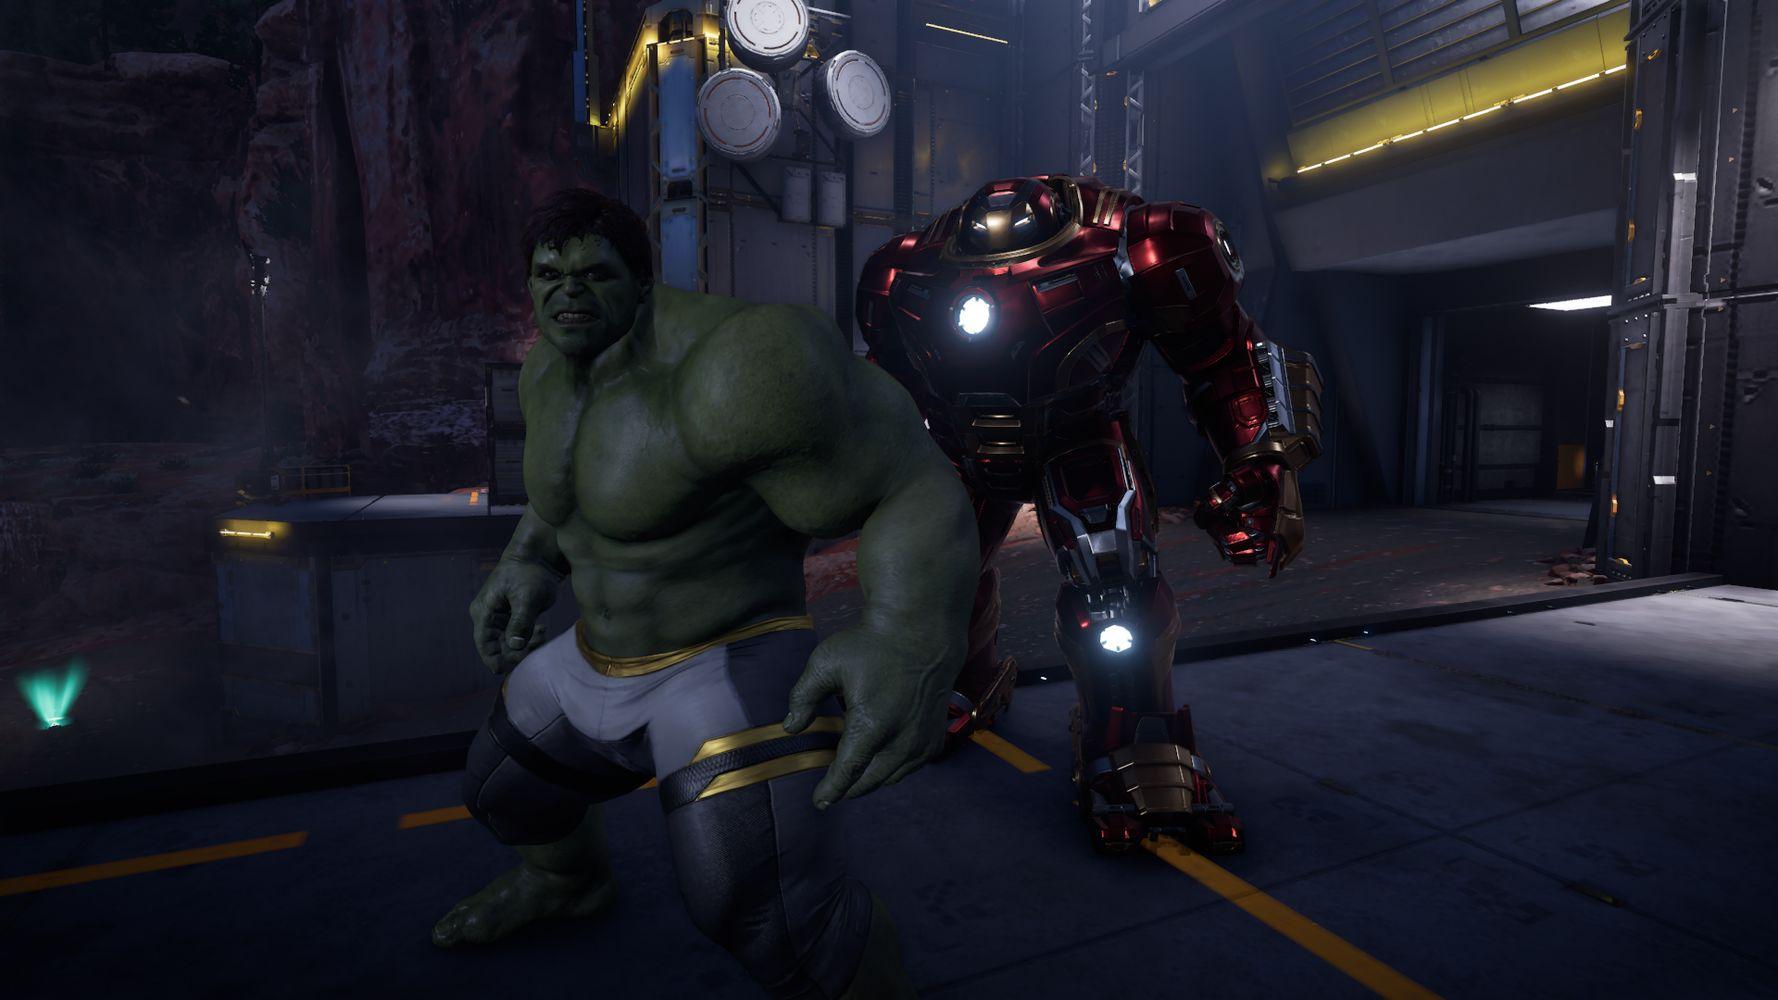 Hulk e Hulkbuster a confronto in Marvel's Avengers